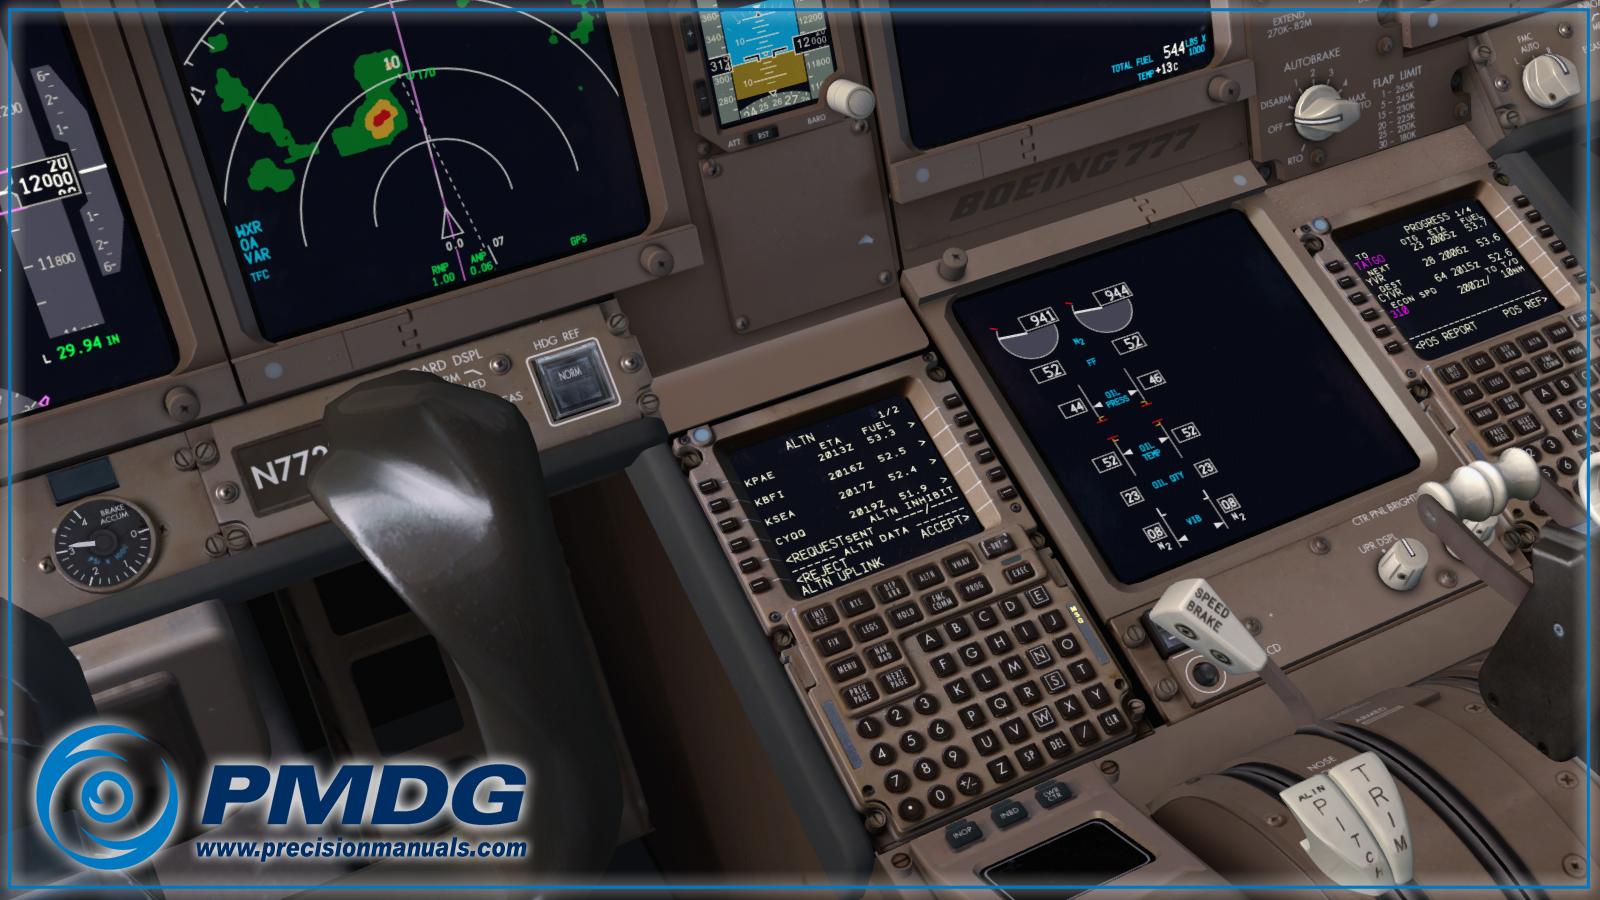 pmdg_777_radar3.jpg